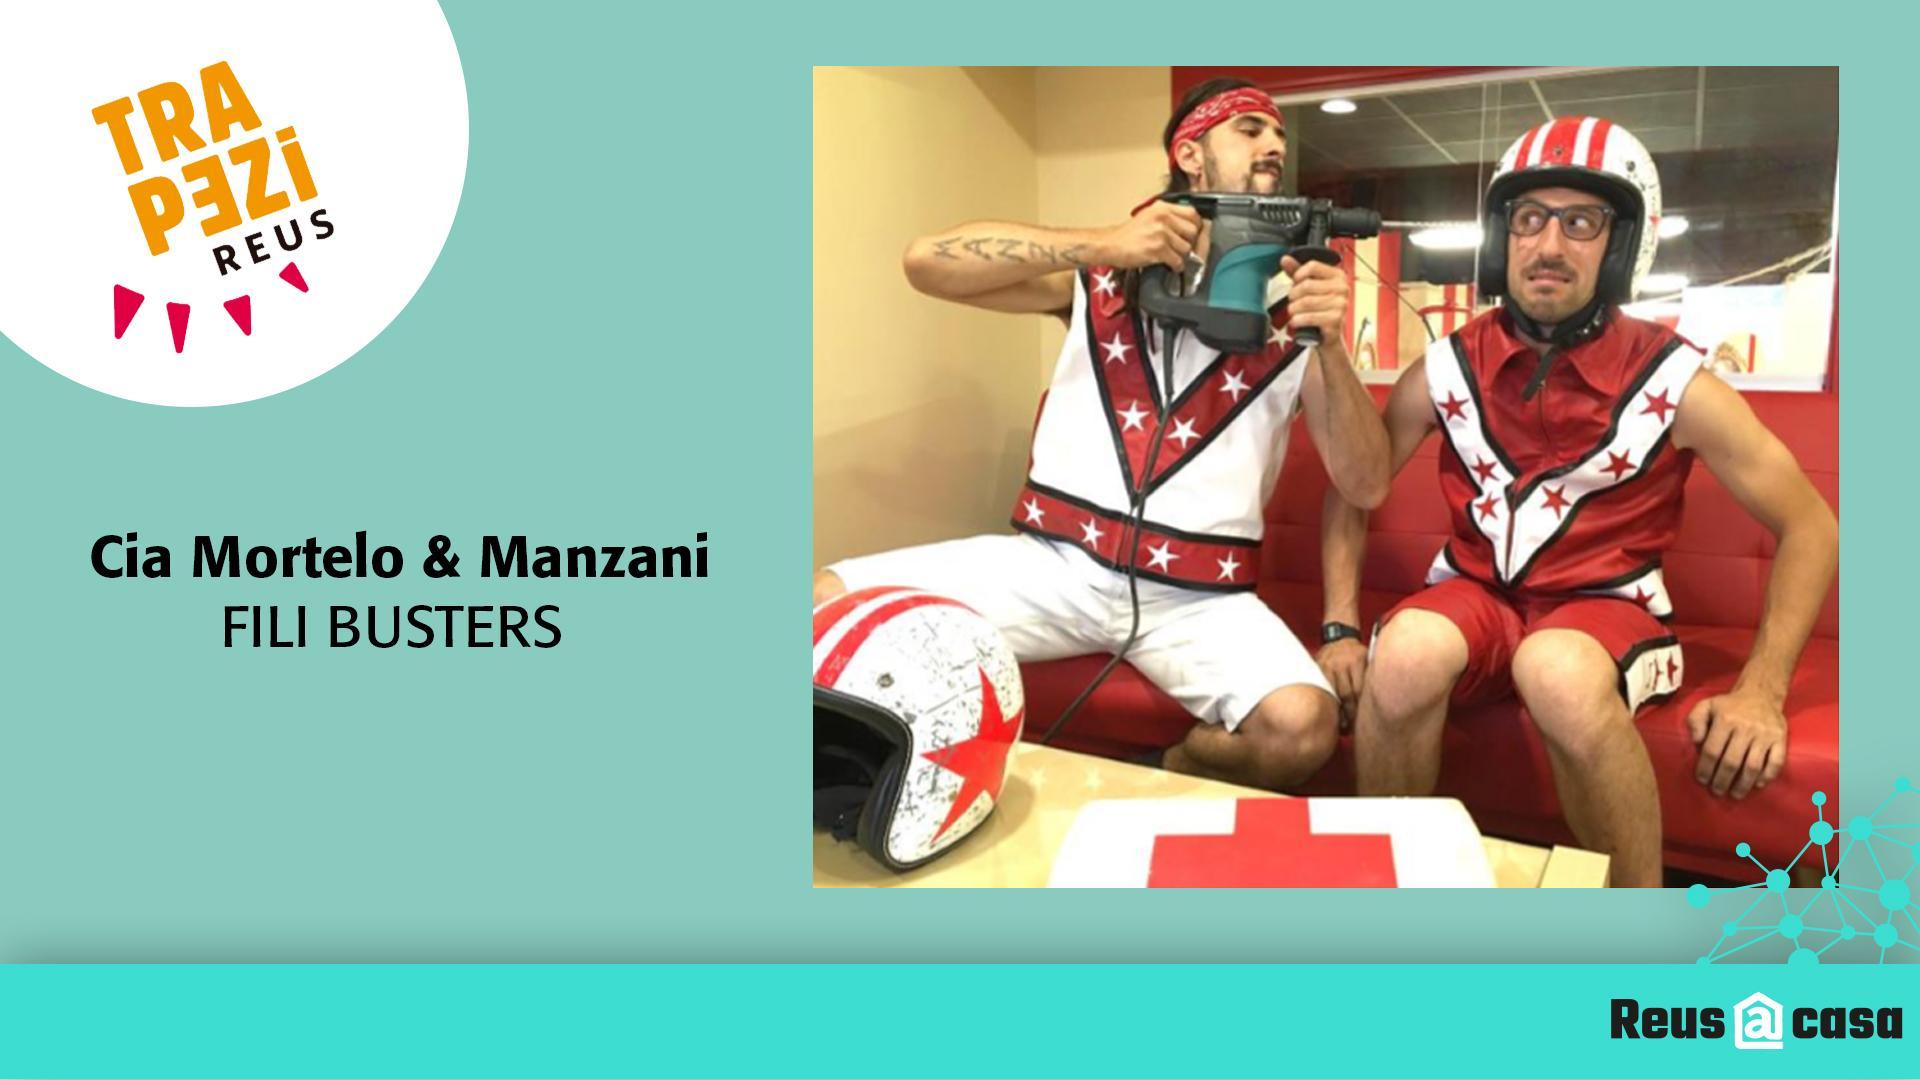 Fira Trapezi Reus: Cia. Mortelo & Manzani - Fili Busters